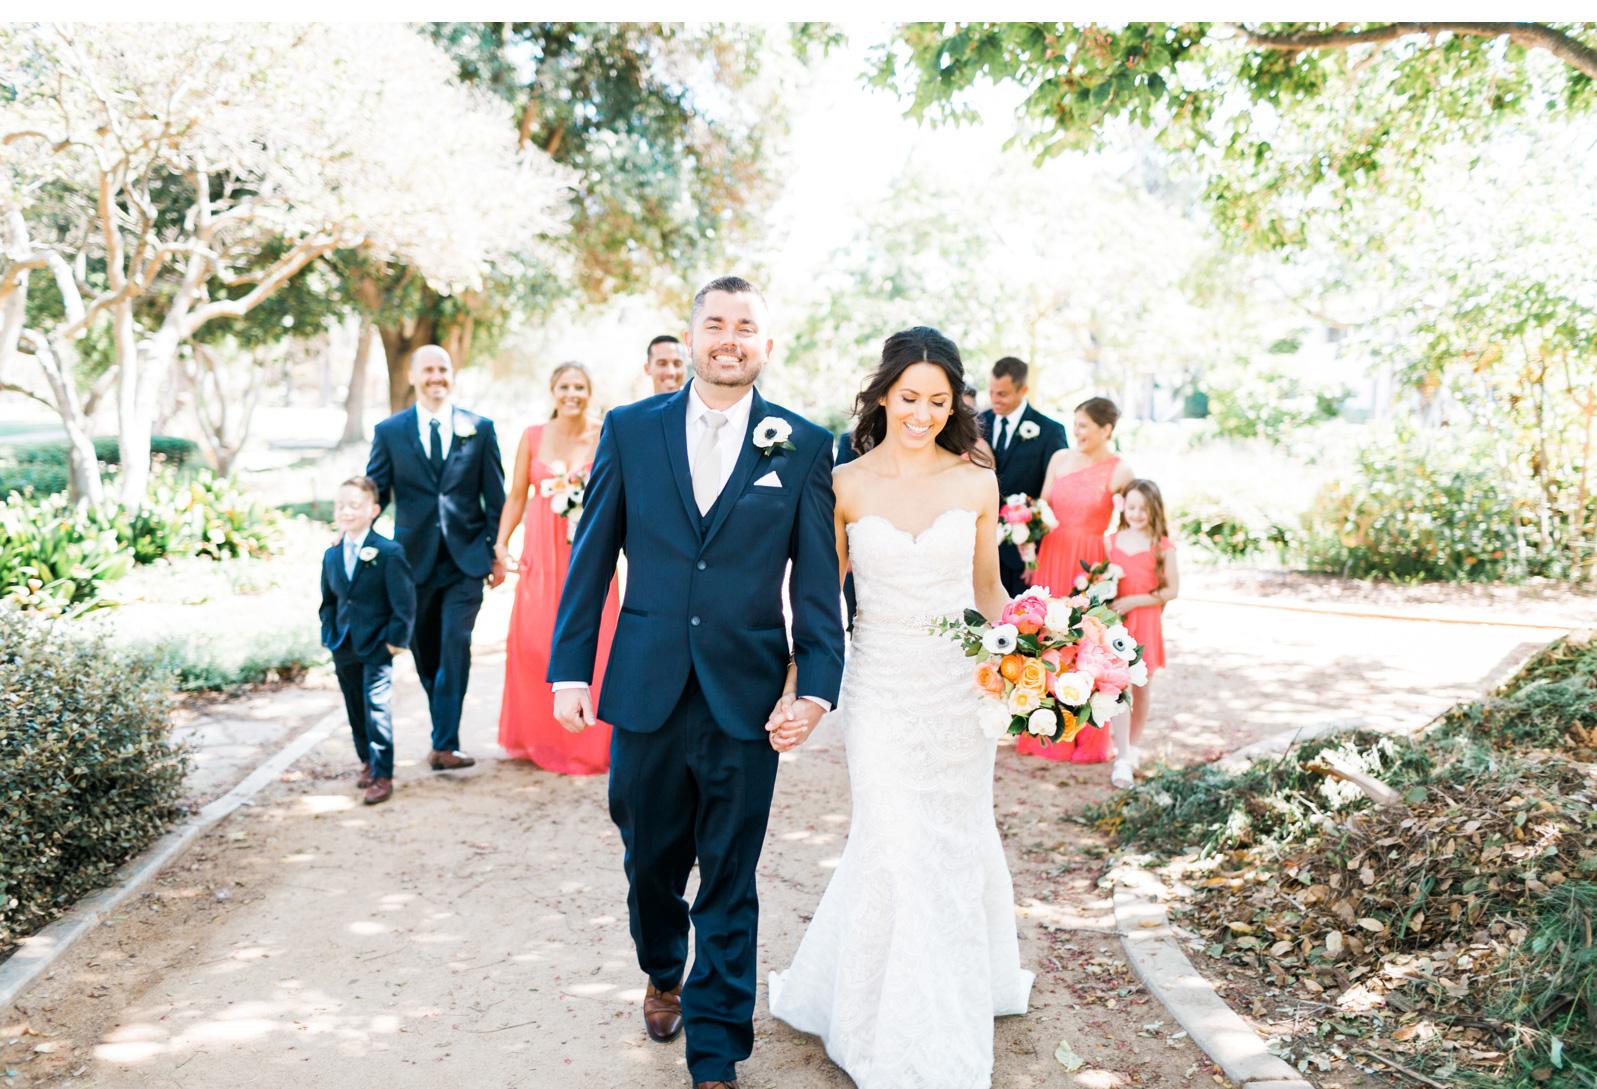 Southern-California-Santa-Barbara-Wedding-Photographer-Natalie-Schutt-Photography_14.jpg